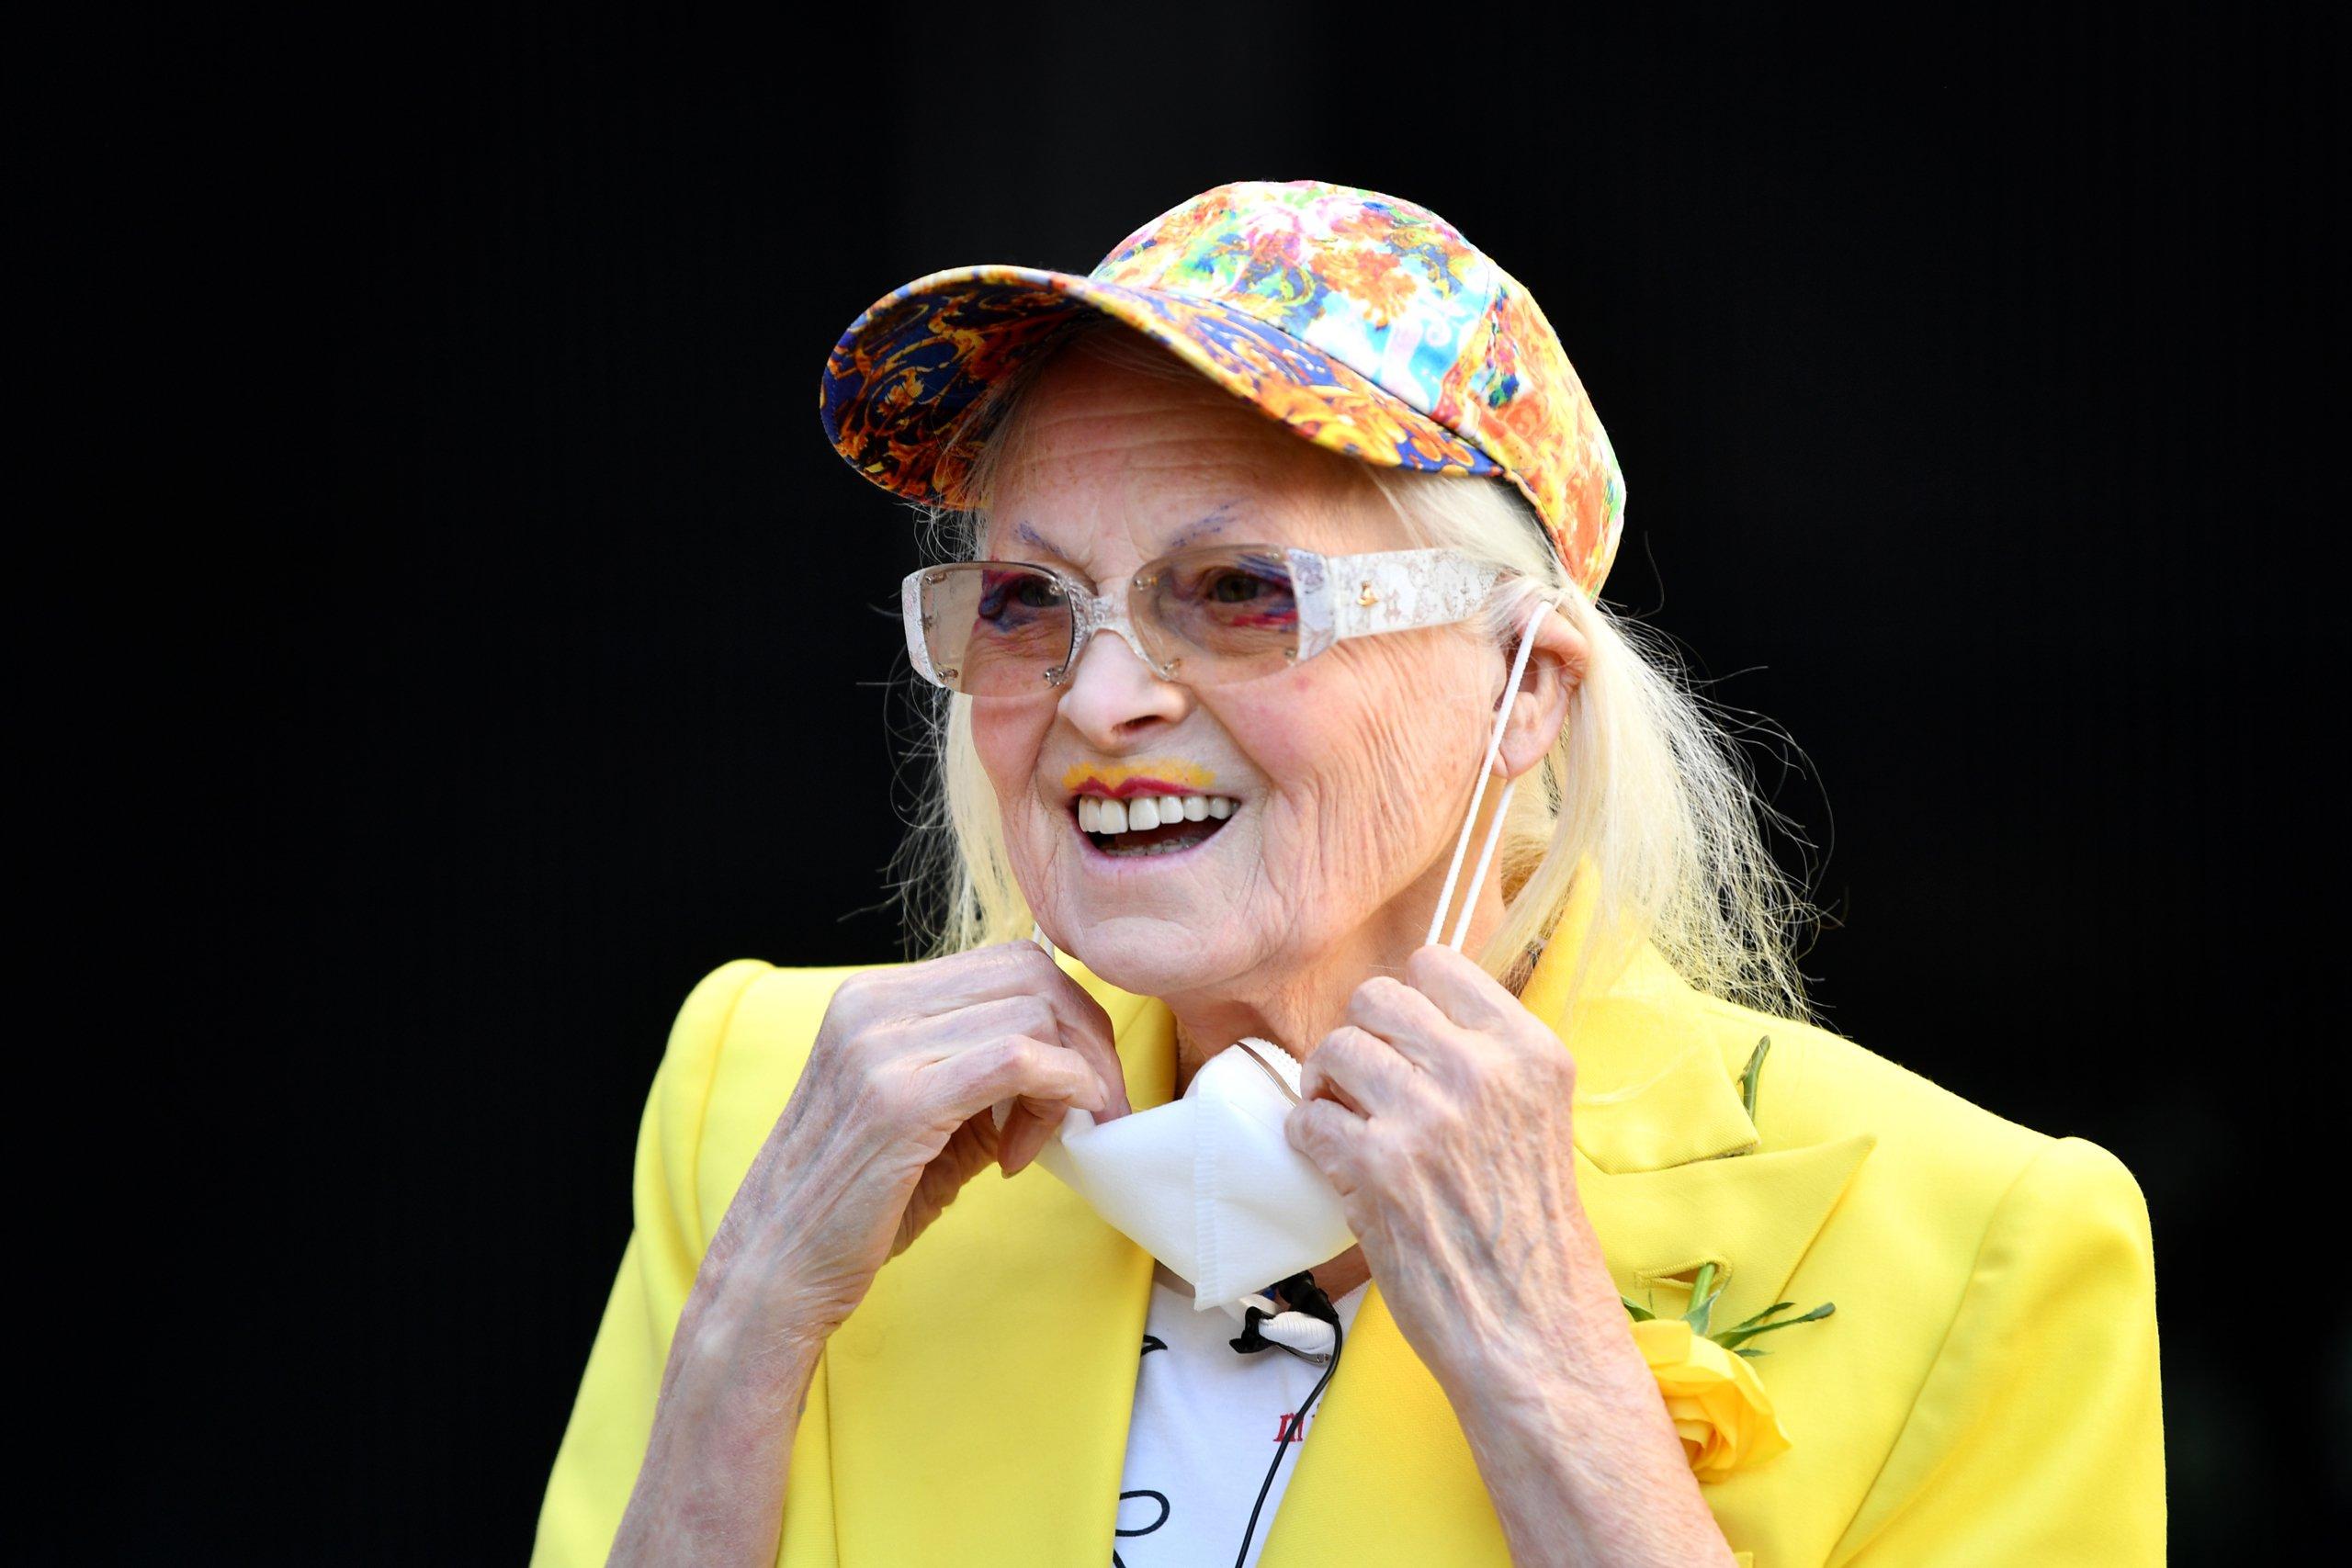 Dame Vivienne Westwood Suspends 10 Ft High Inside Giant Bird Cage In Protest For Julian Assange